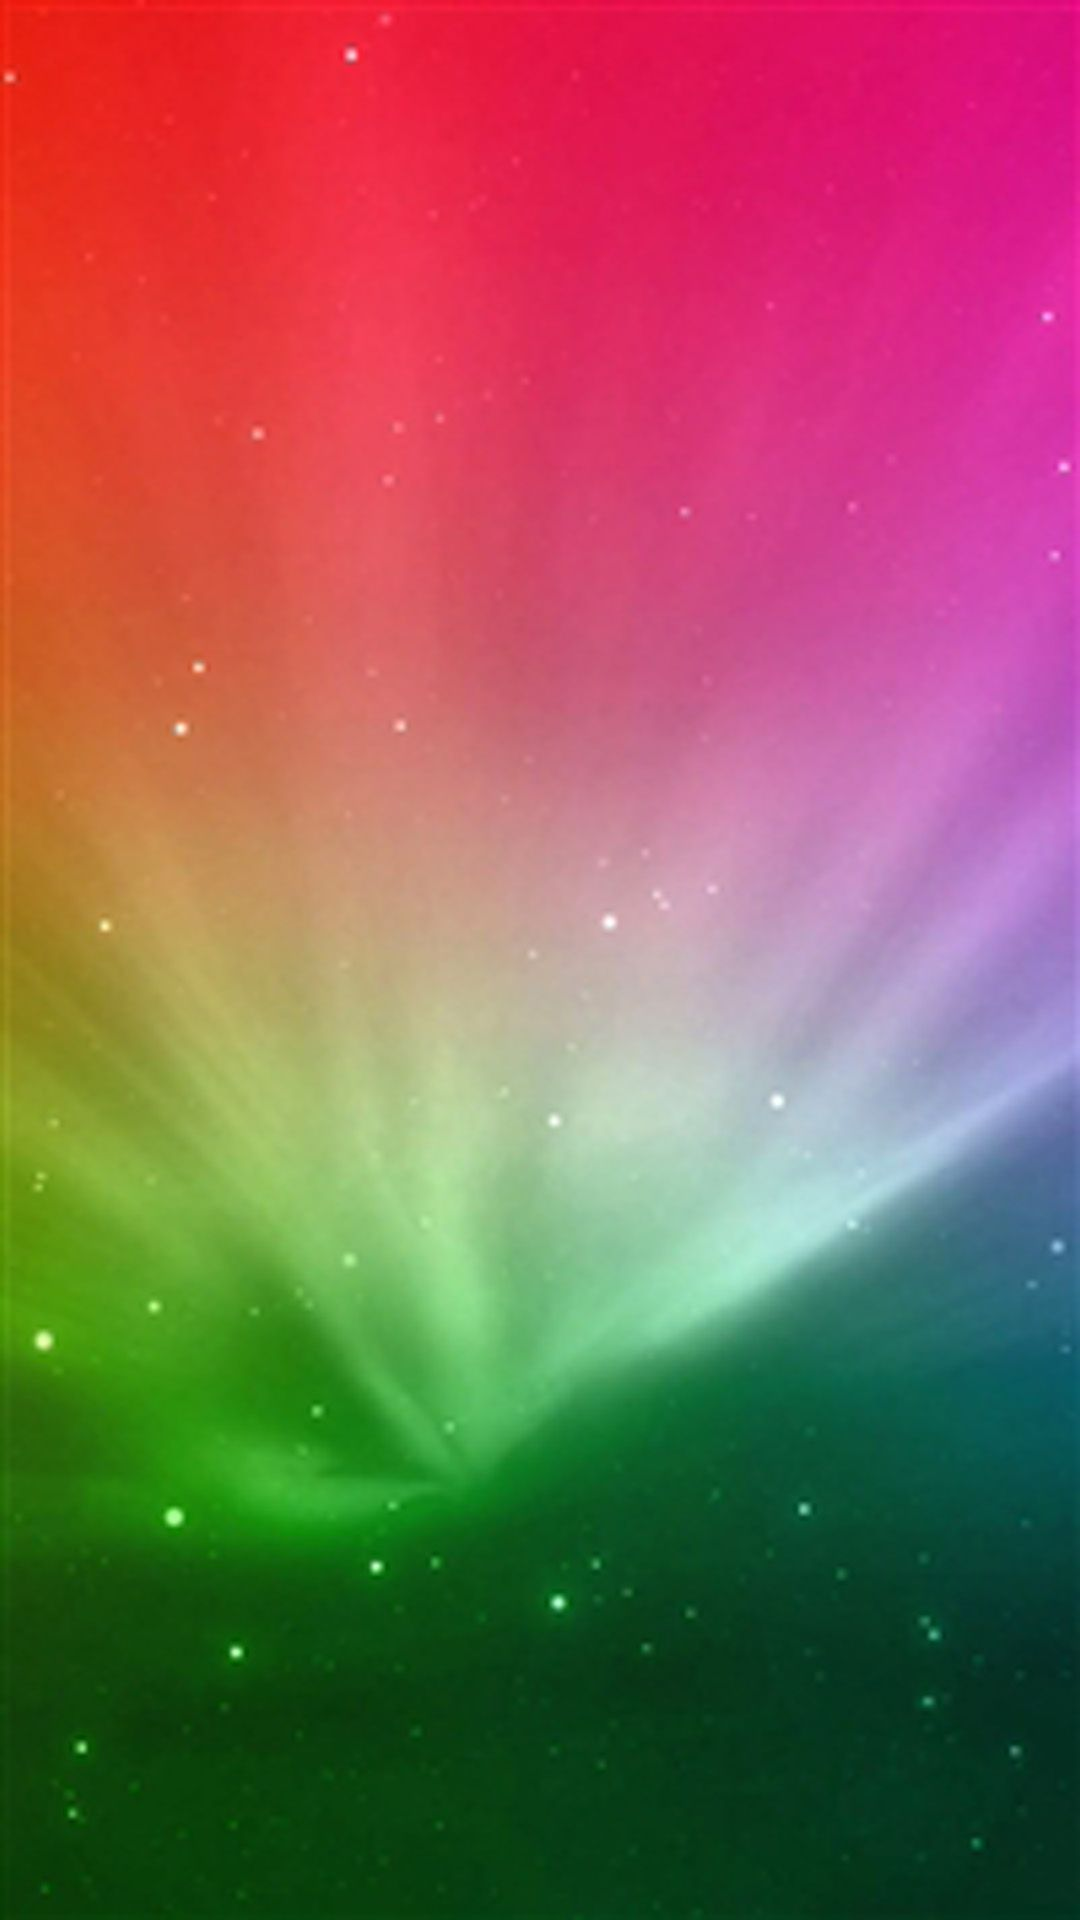 1080x1920px Lg G3 Wallpapers Free Download Wallpapersafari